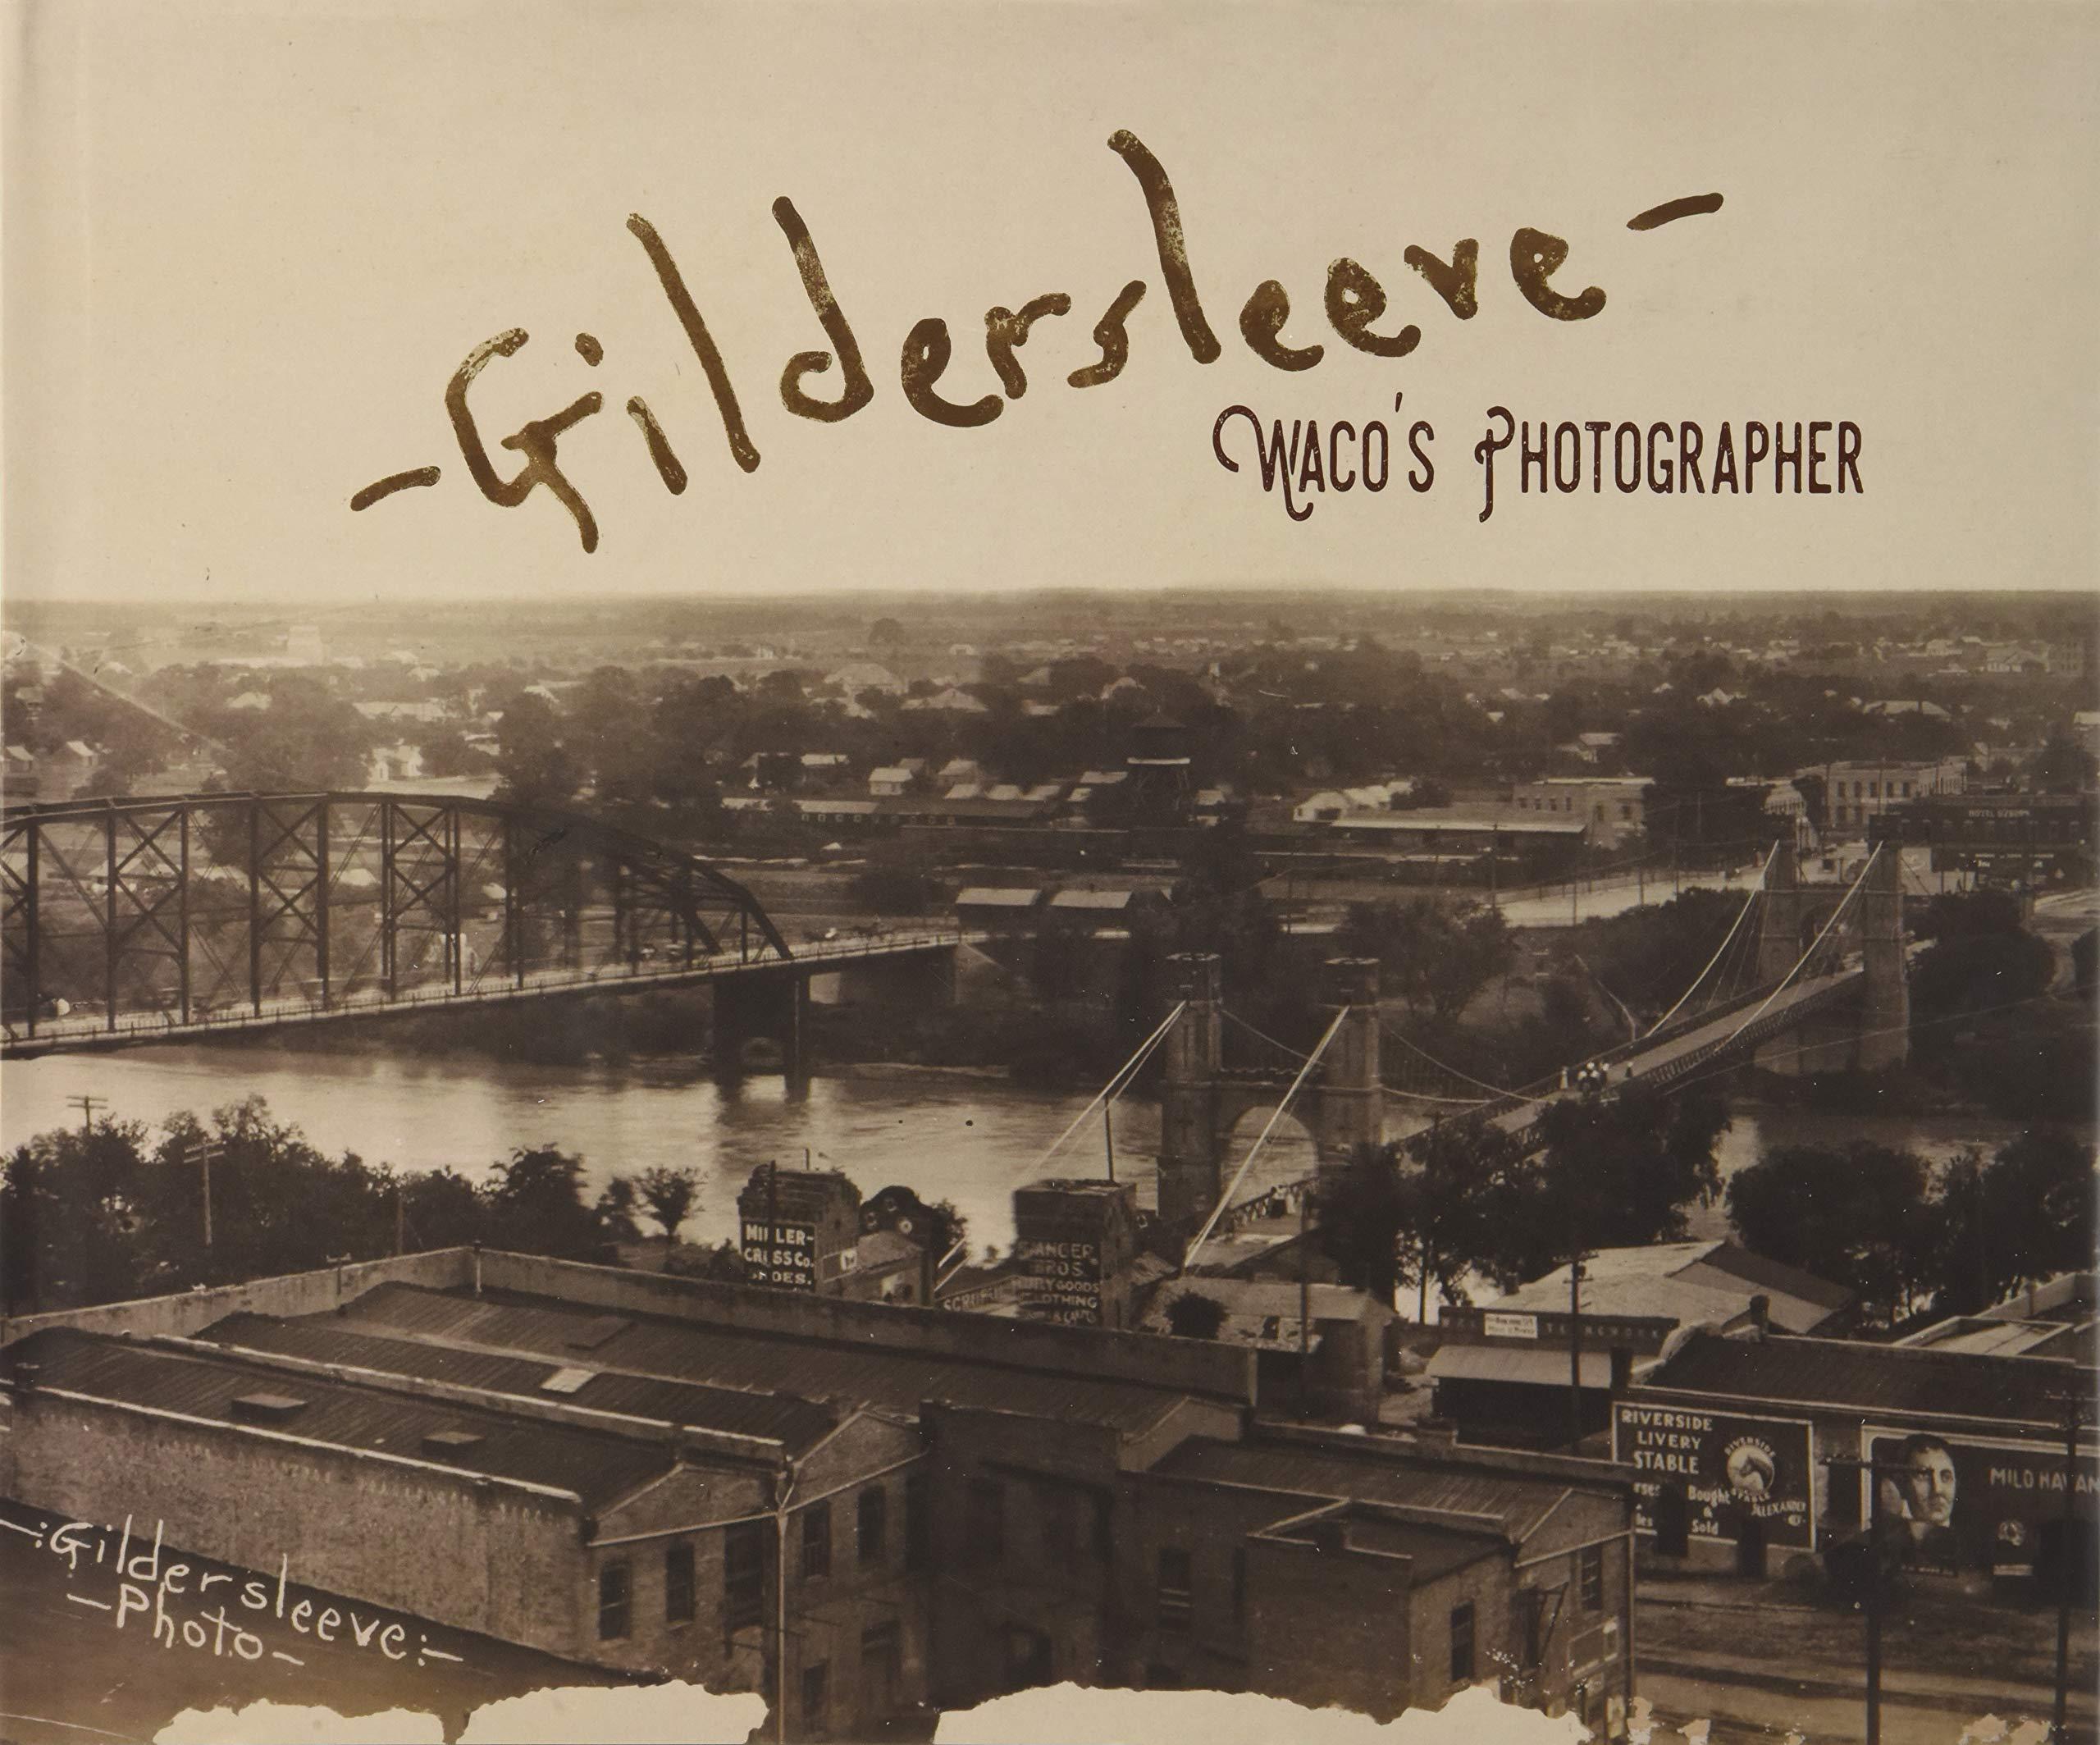 Read Online Gildersleeve: Waco's Photographer (1845 Books) ebook